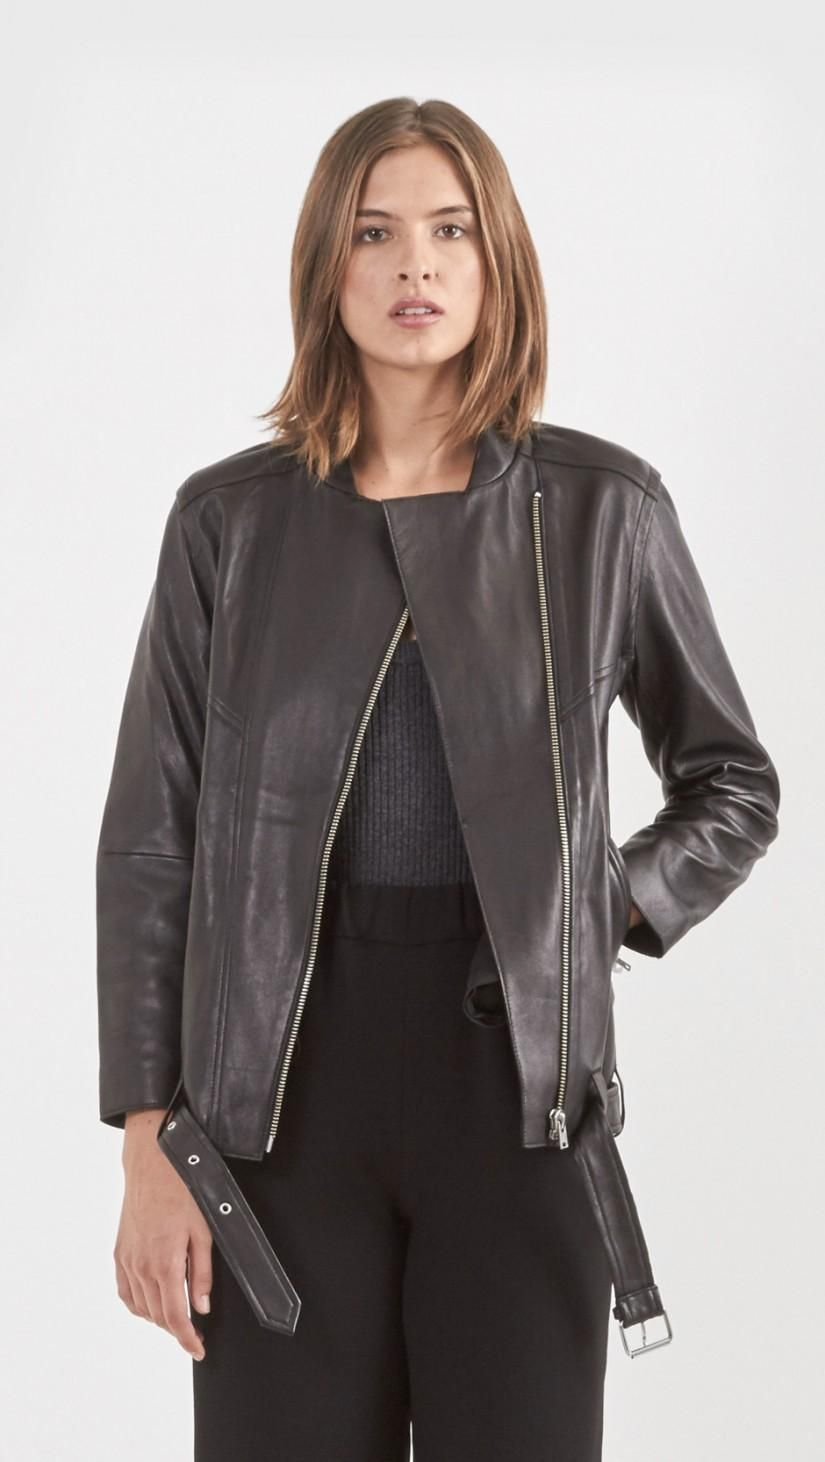 Iro Ametyst Leather Jacket In Black Leather Jacket Jackets Leather [ 1462 x 825 Pixel ]